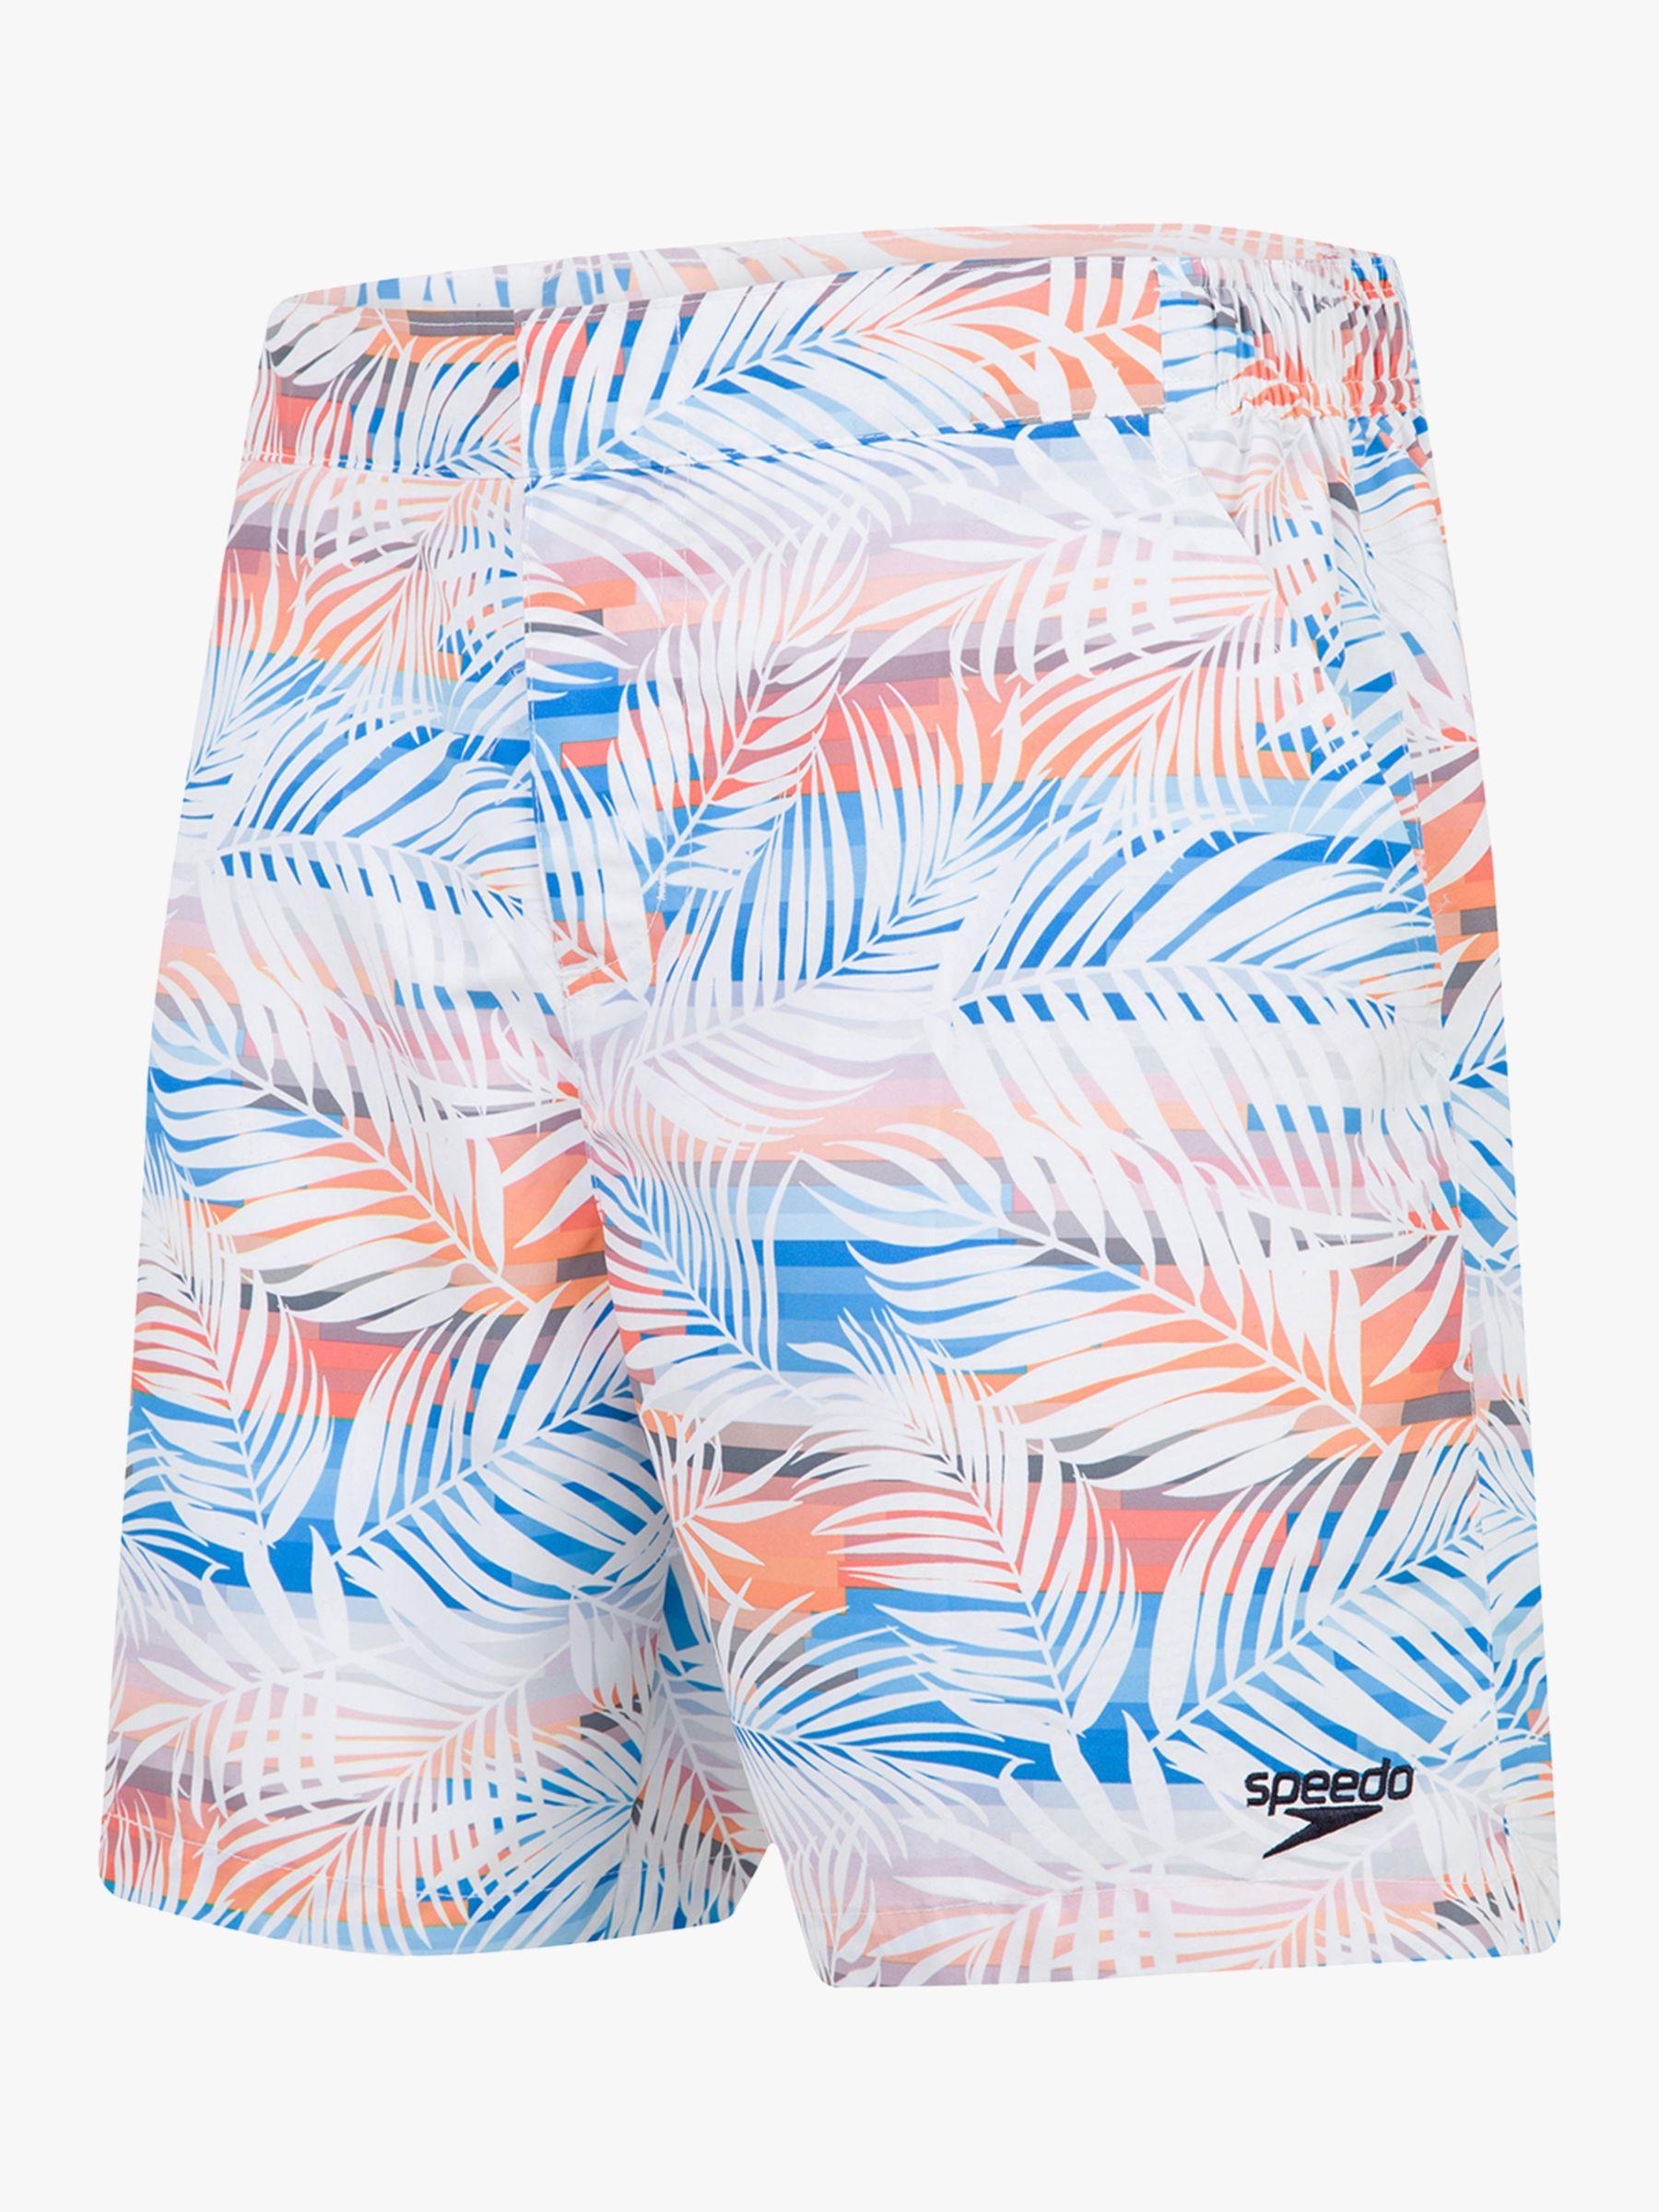 Speedo Speedo Vintage Paradise Print 16 Swim Shorts, Palm White/Mango